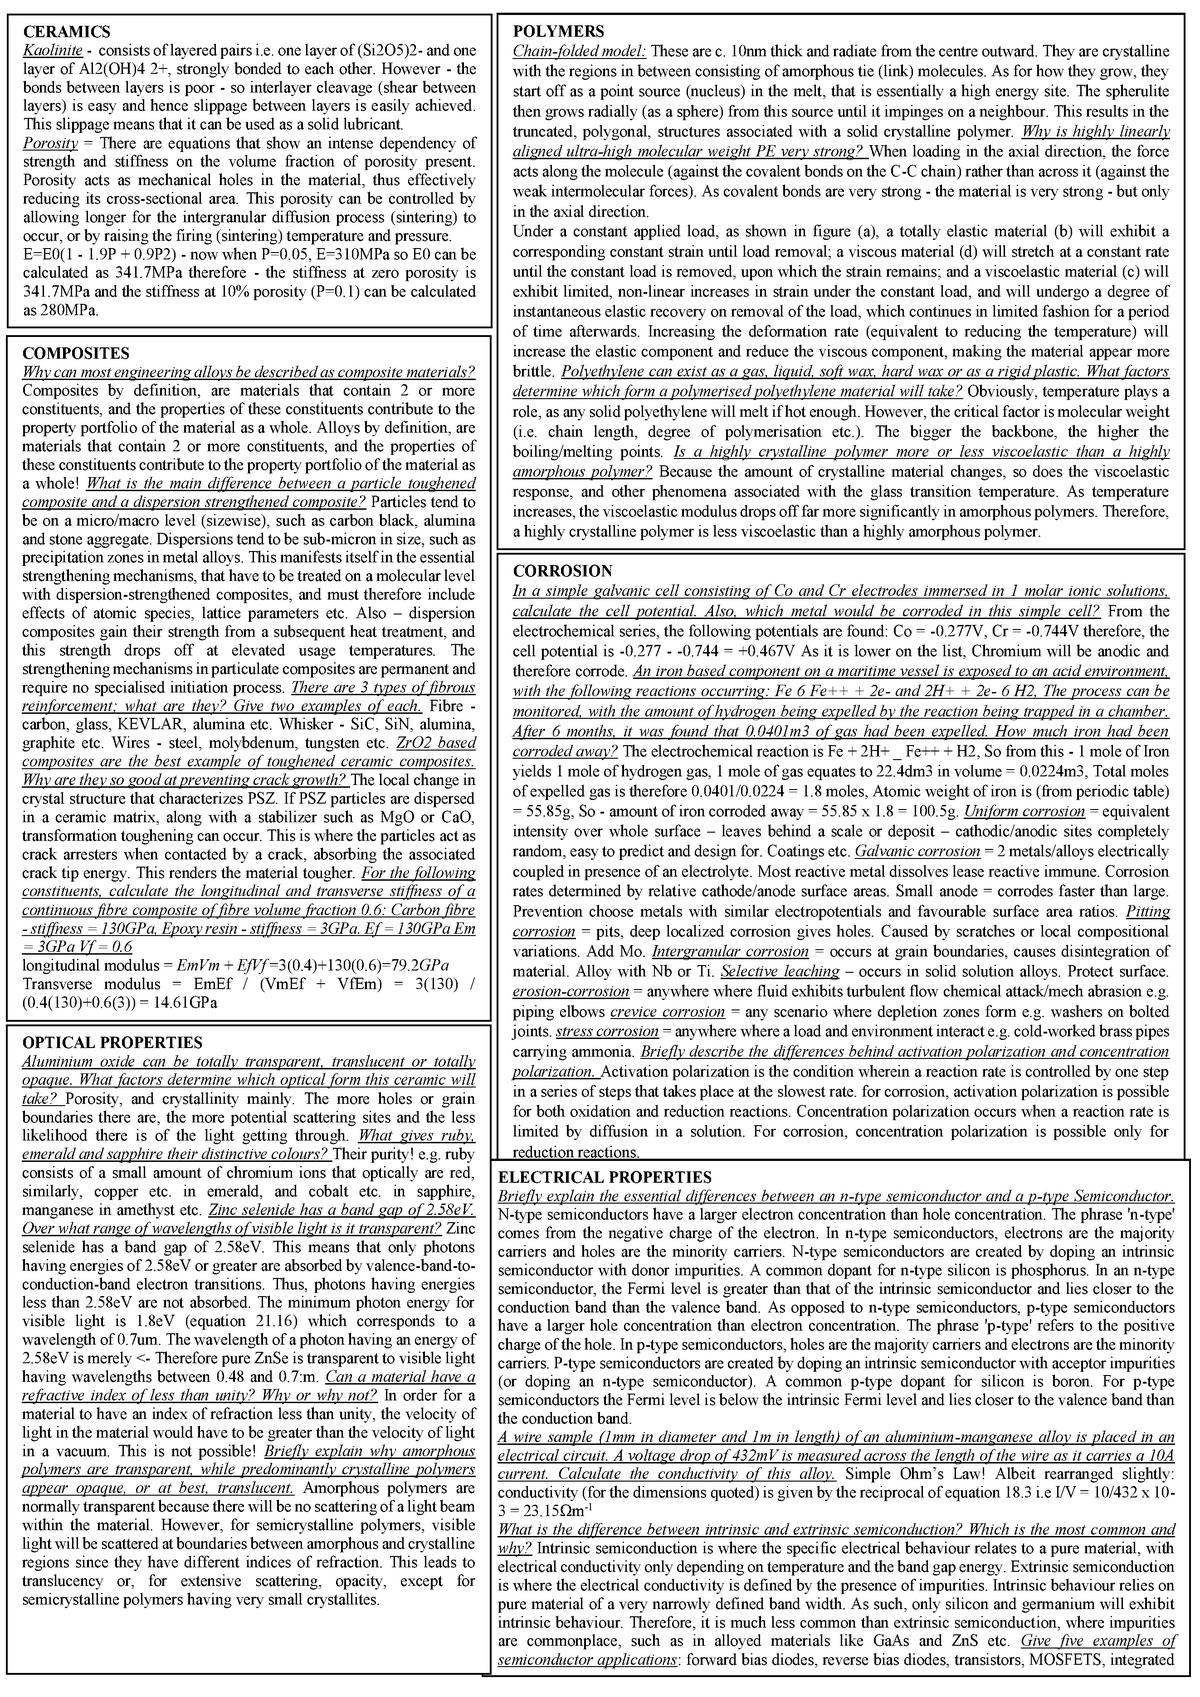 Cheat Sheets - Summary Engineering Sciences - ENGN1215 - StuDocu